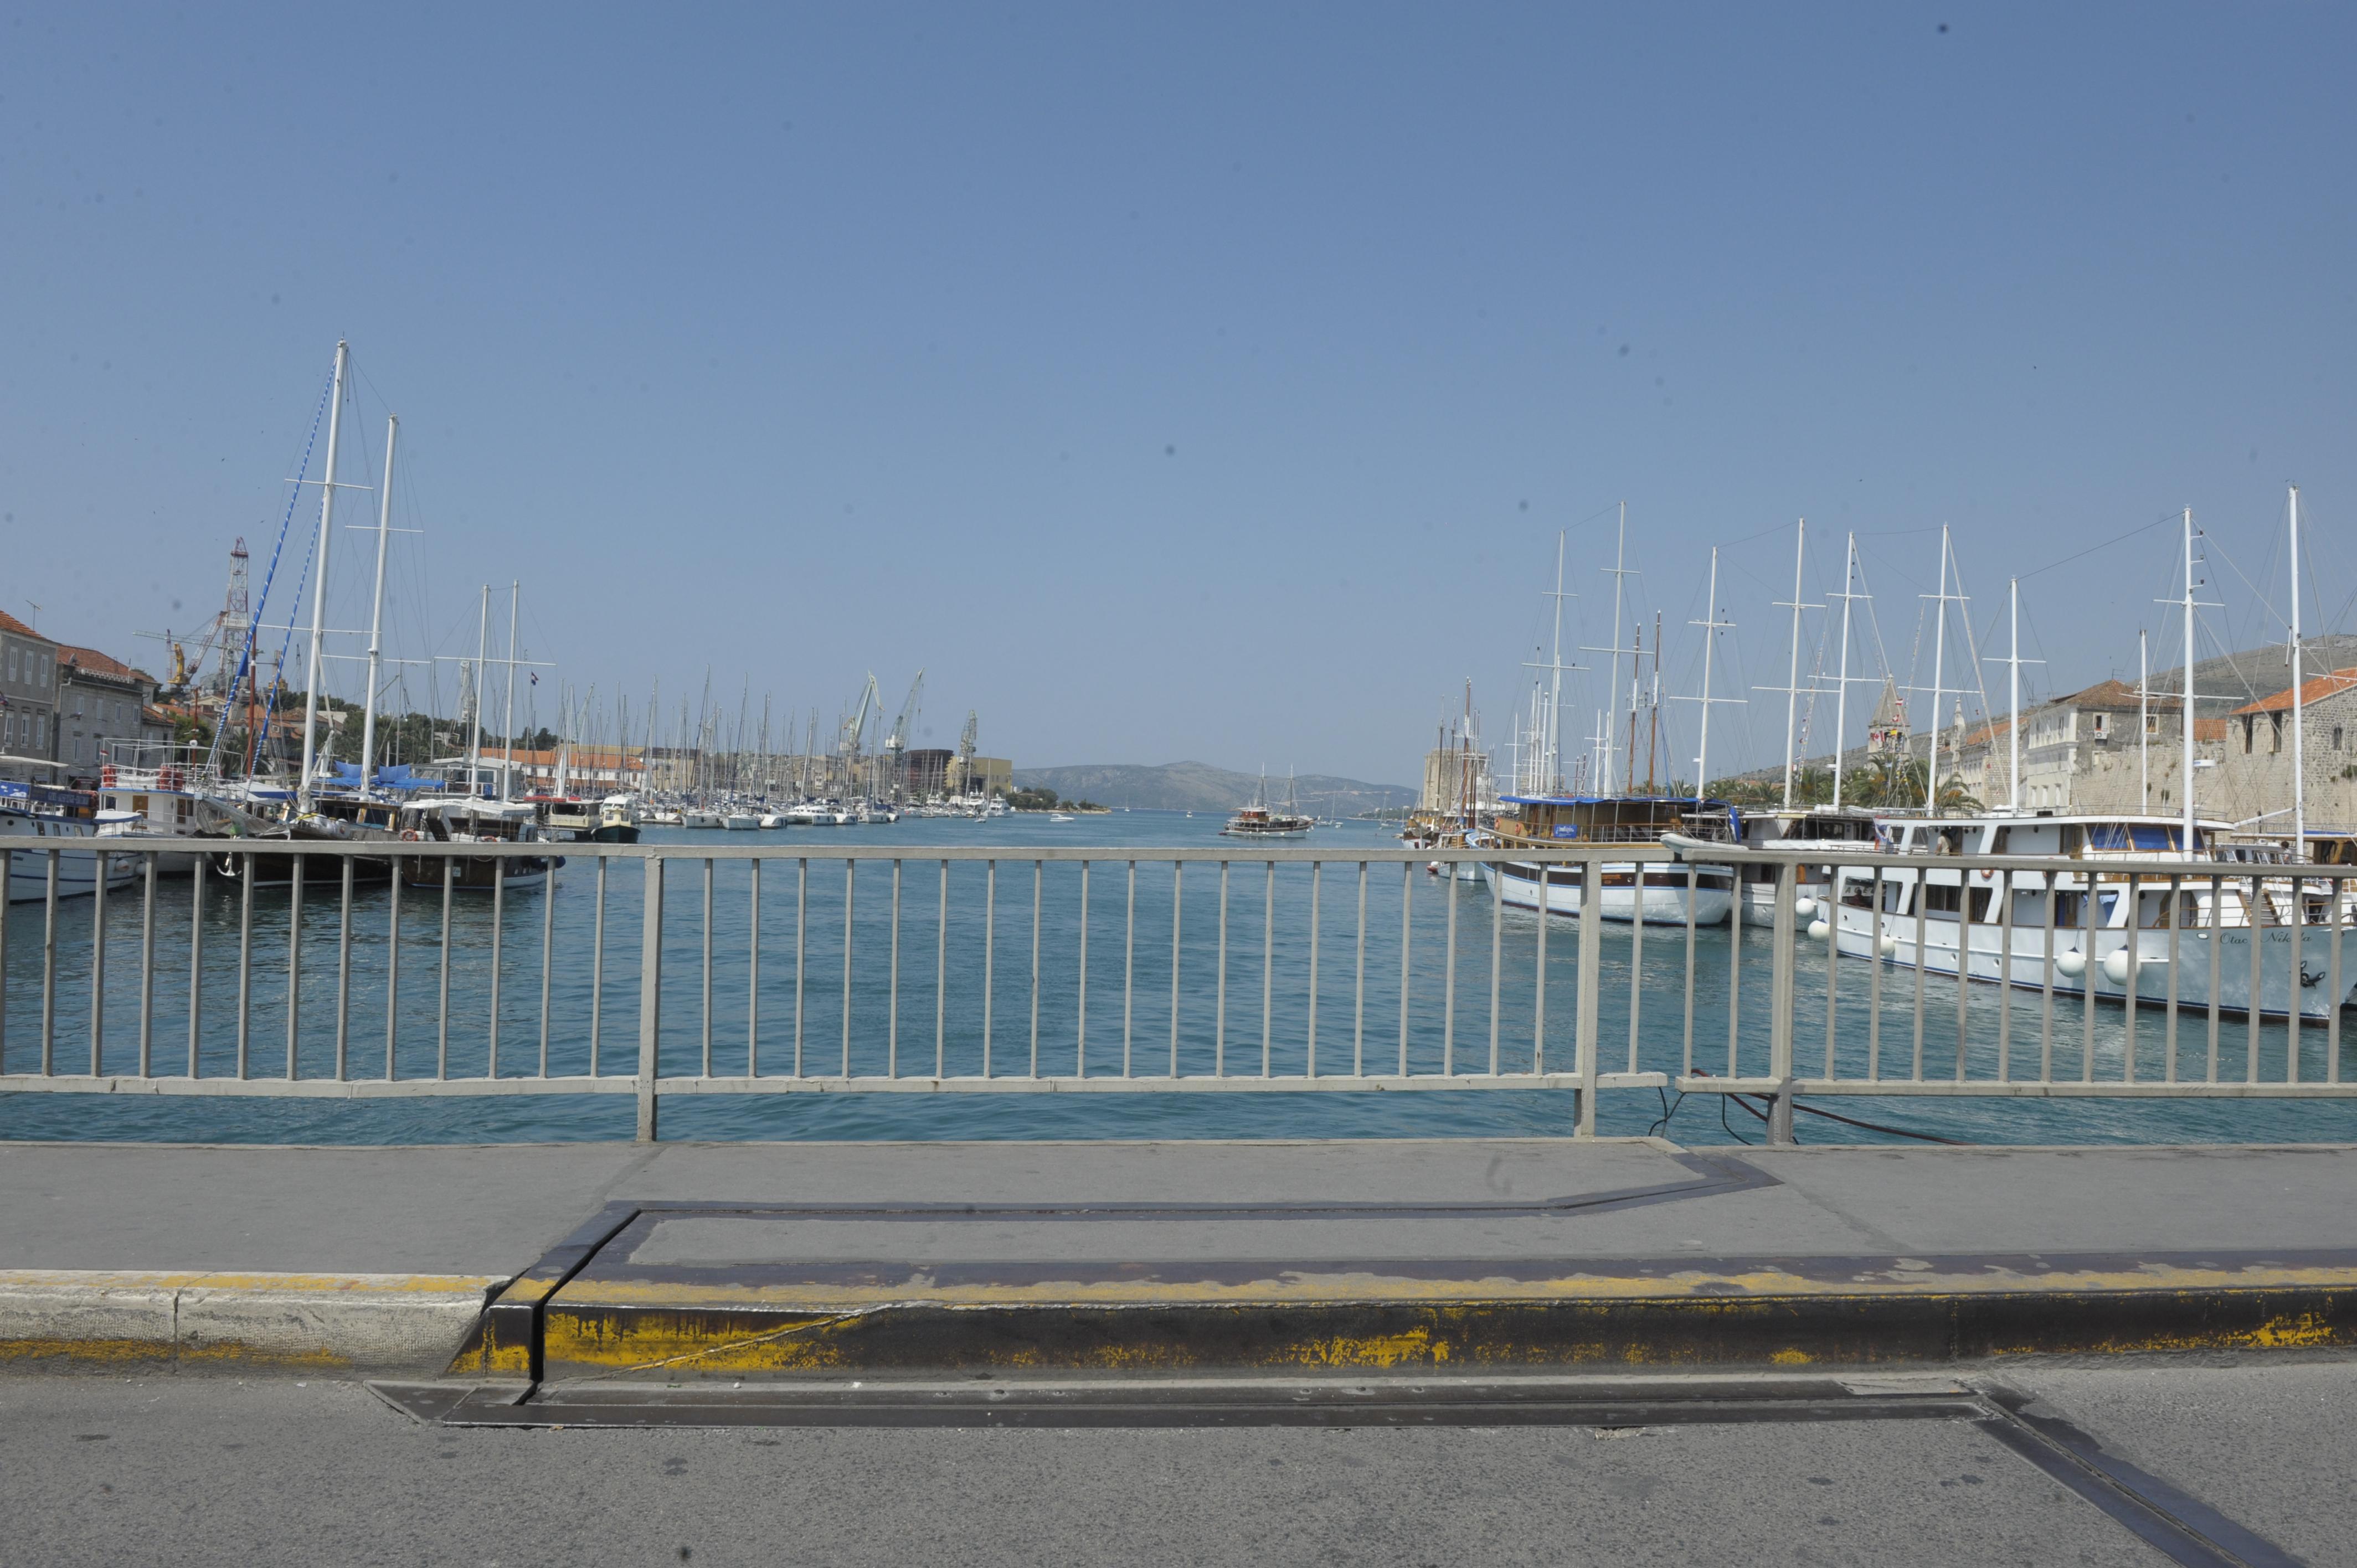 Lavrion (Athenian Yachts)